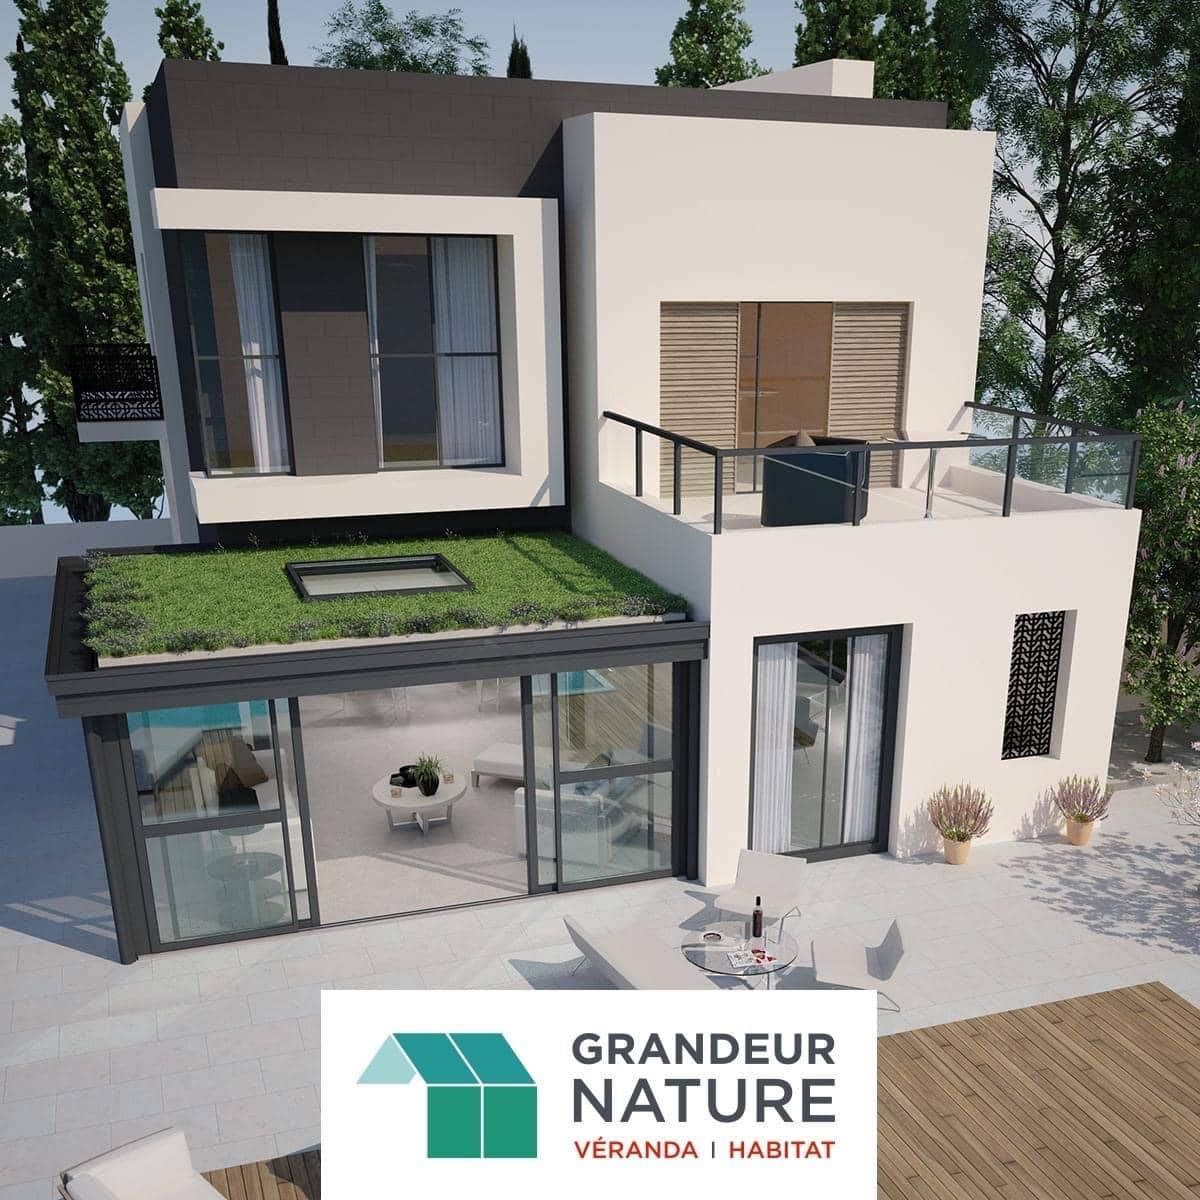 veranda_extension_grandeur_nature_extend